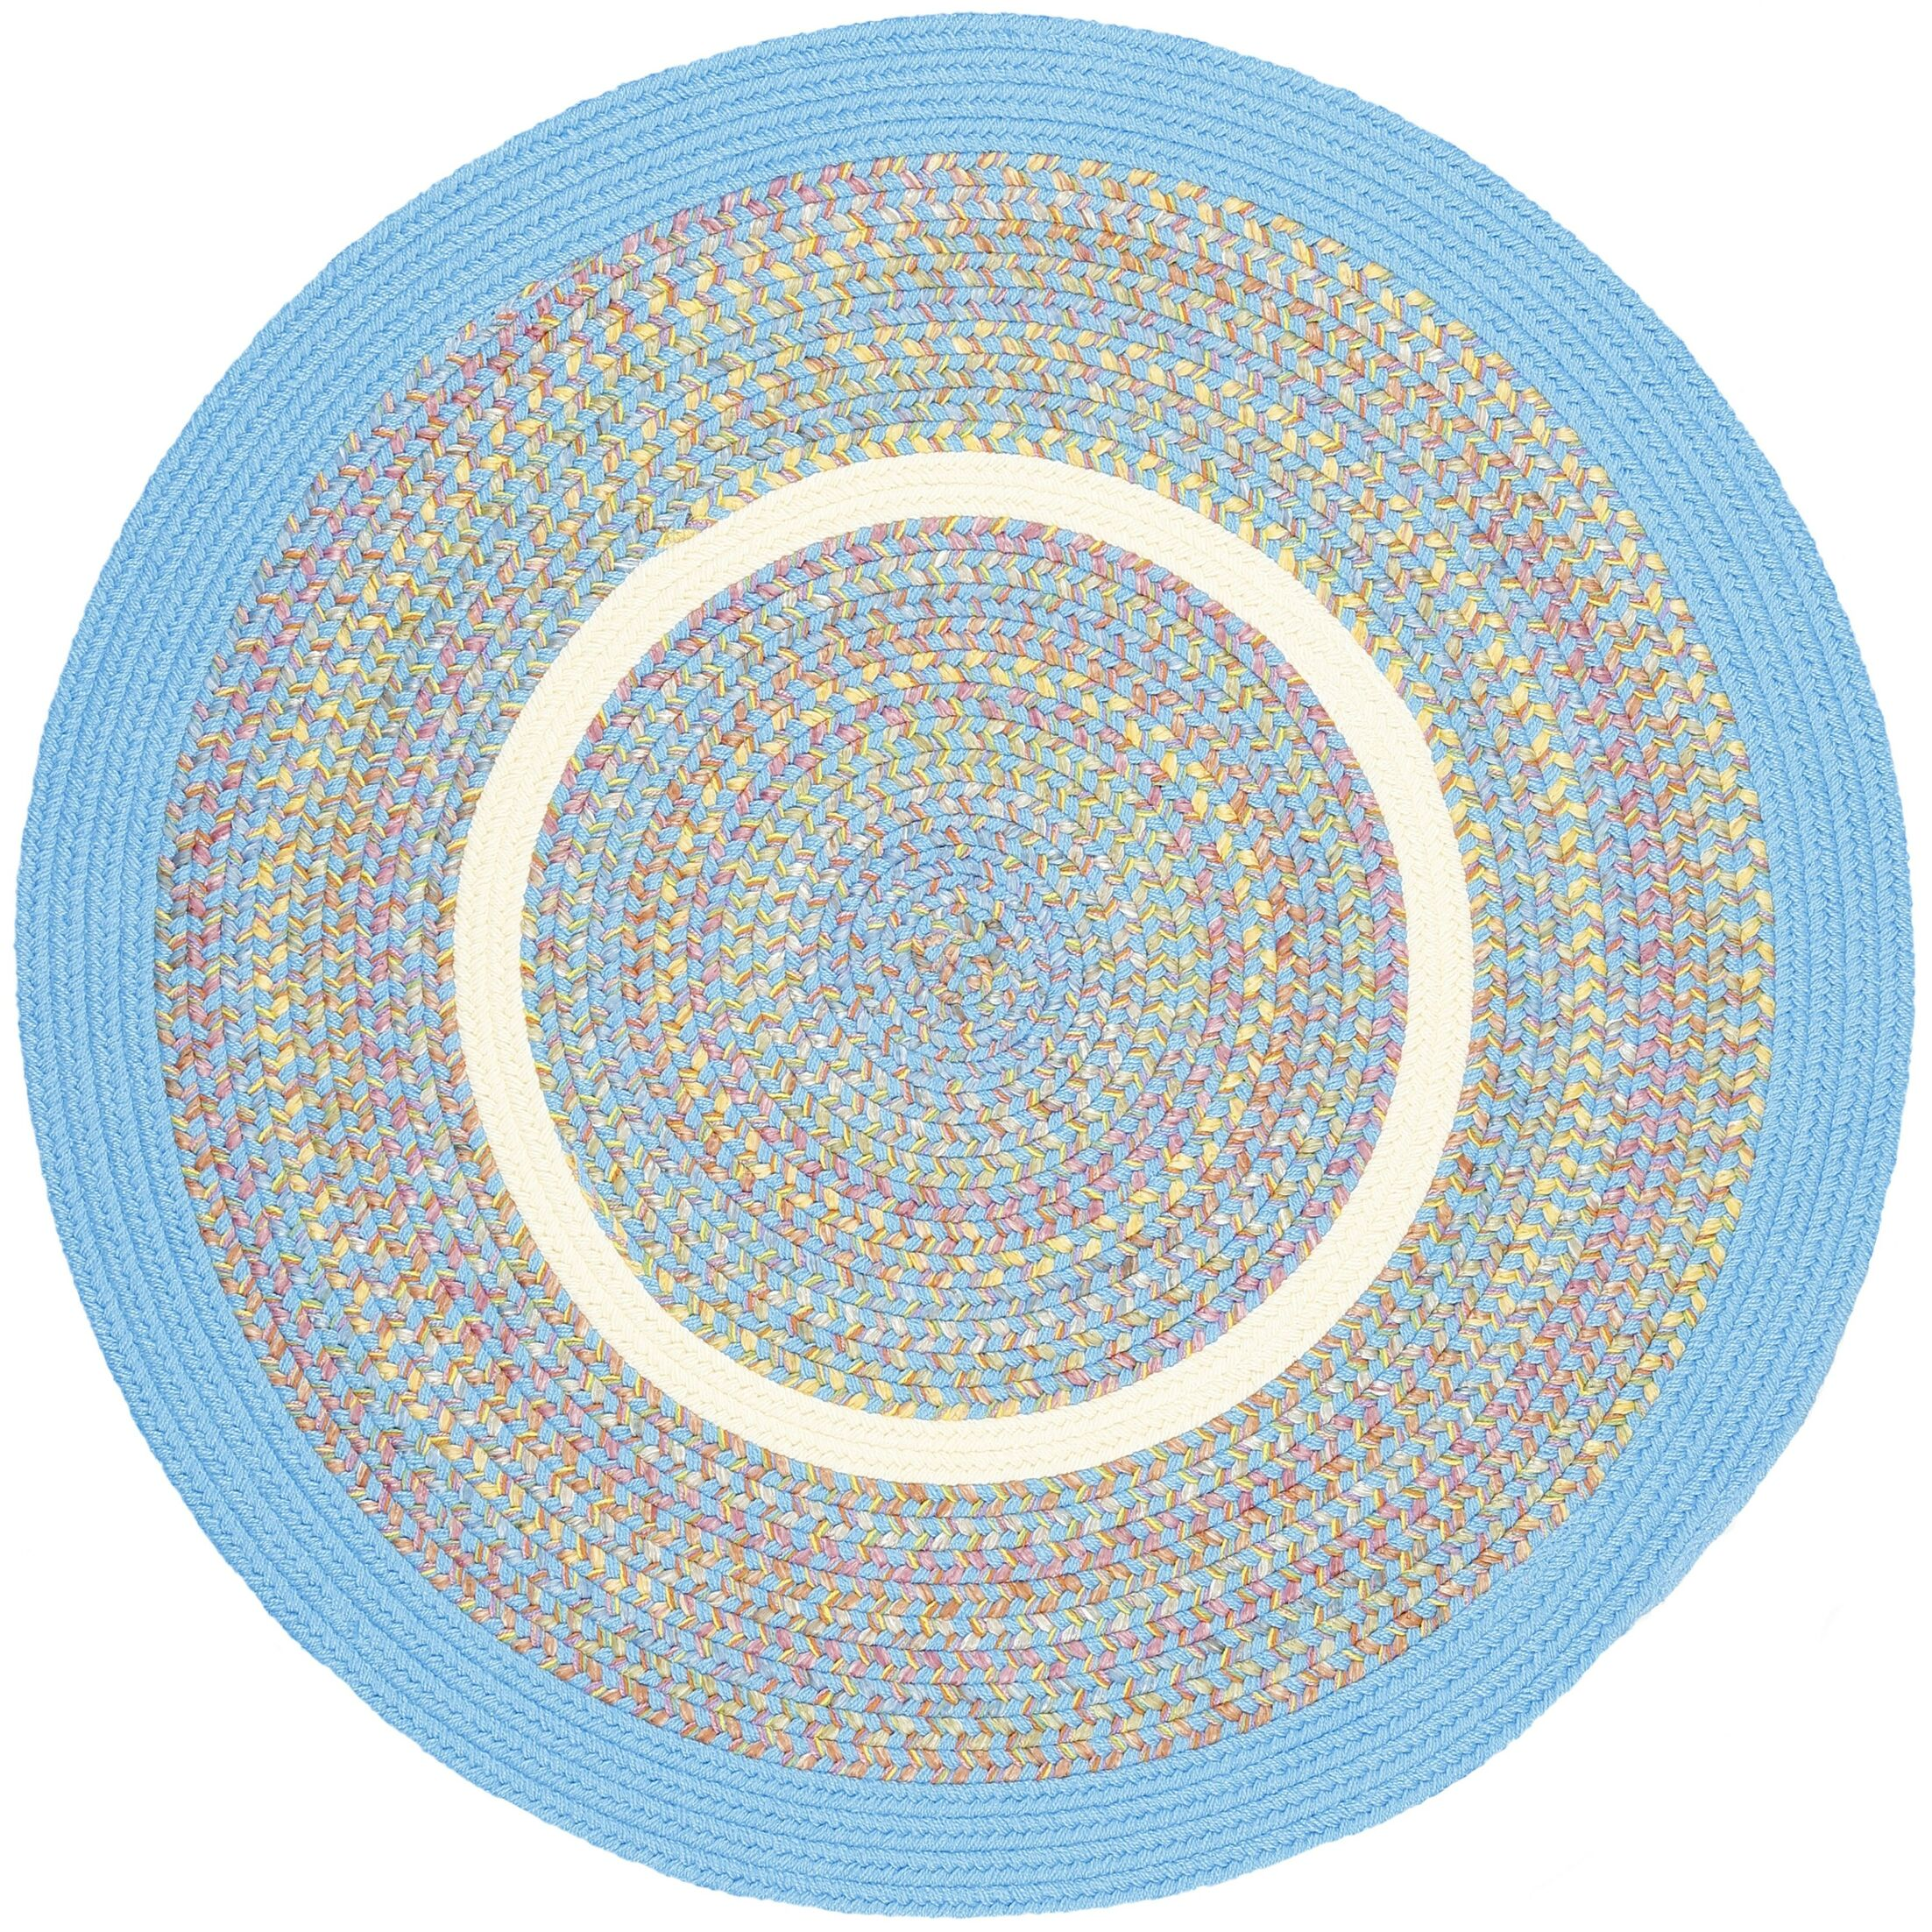 Sahaswan Blue Indoor/Outdoor Area Rug Rug Size: Round 4'